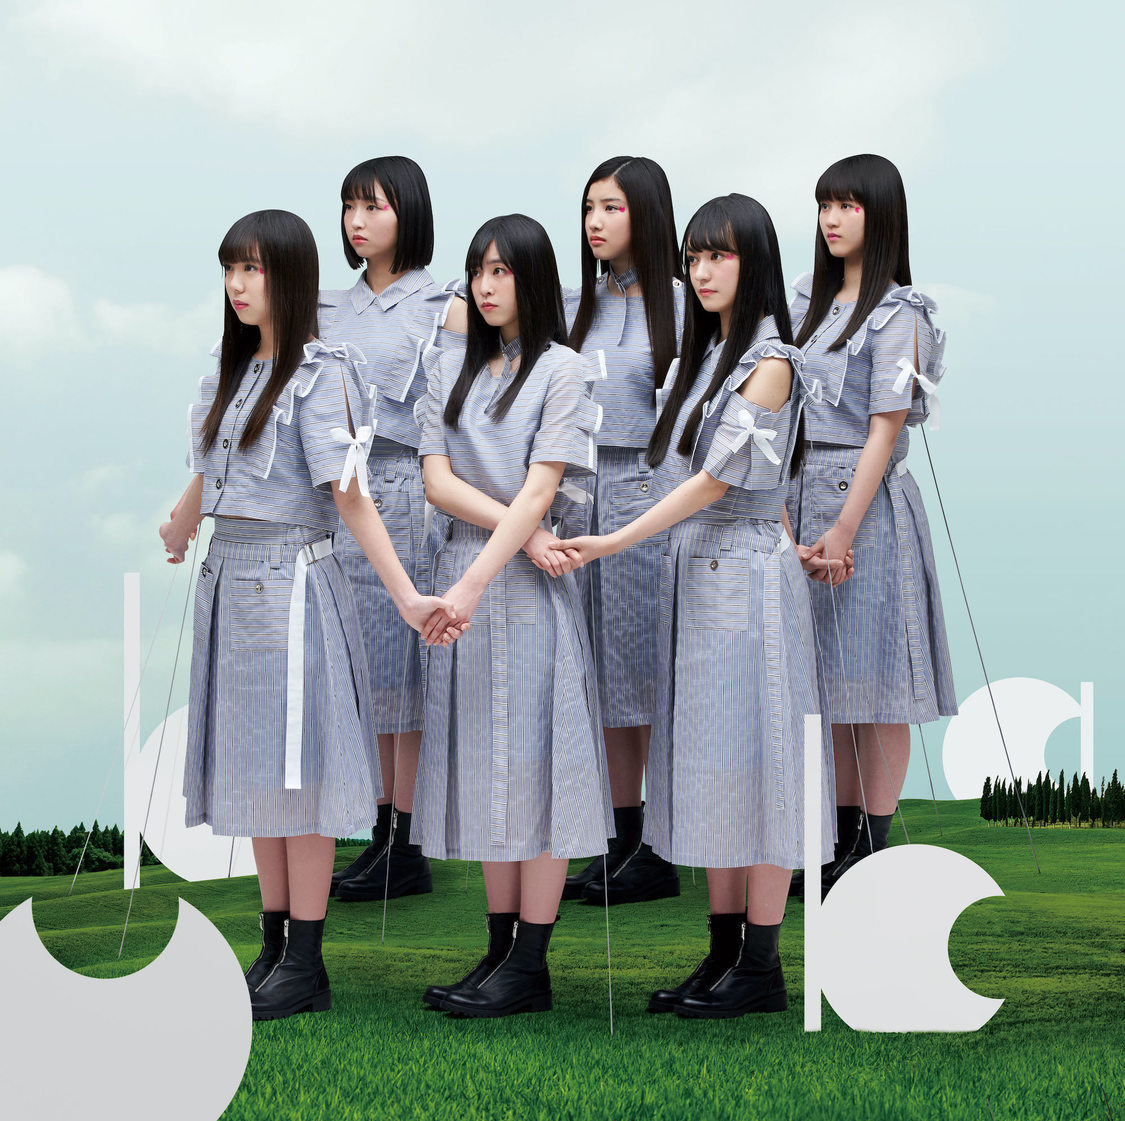 ukka、1st SG「恋、いちばんめ」をゲリラ販売!? 2店舗限定で先行販売スタート